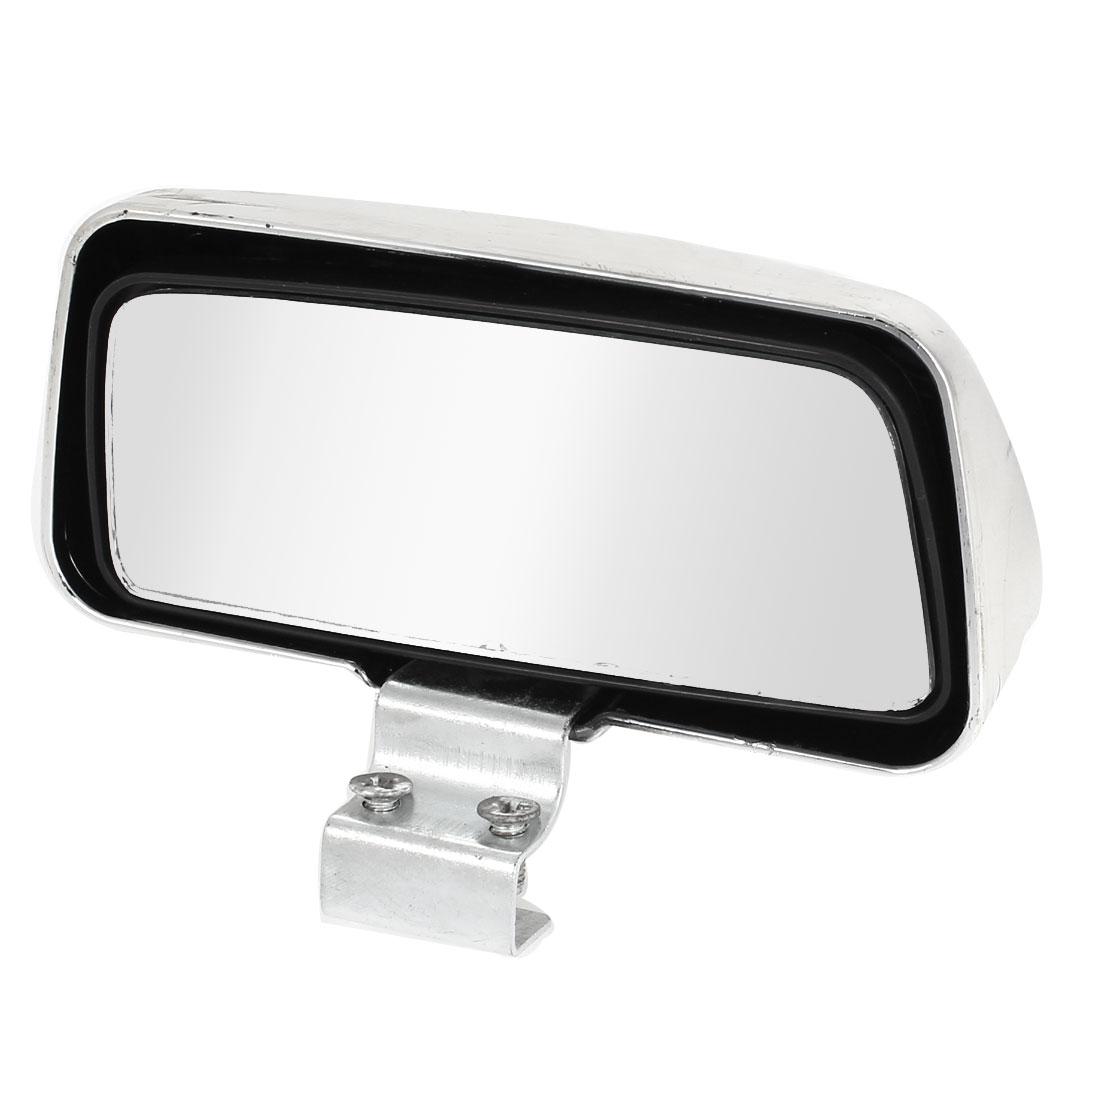 Unique Bargains Silver Tone Plastic Vehicle Rear View Blind Spot Mirror for Vehicle Car